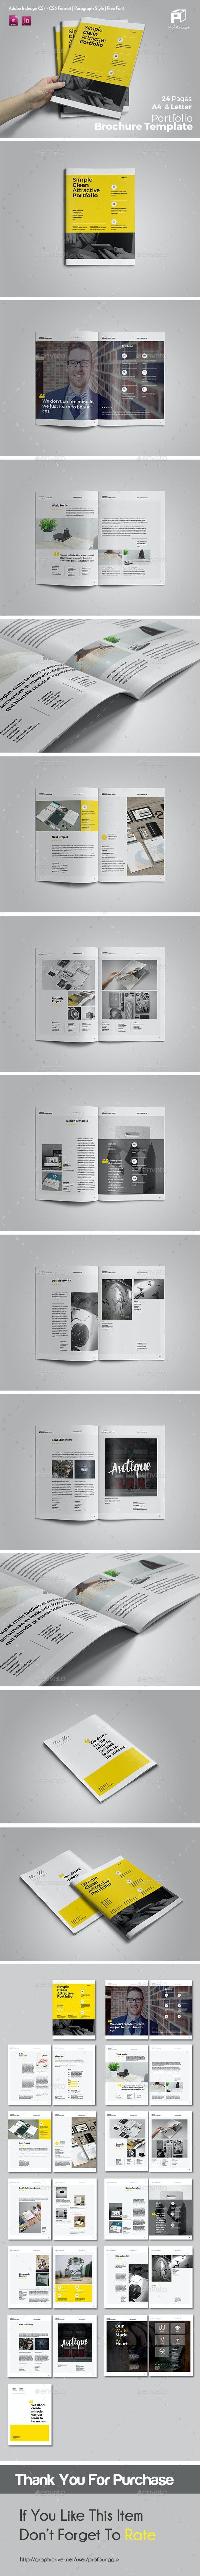 Clean Potrait Multipurpose Brochure Vol.2 - Portfolio Brochures